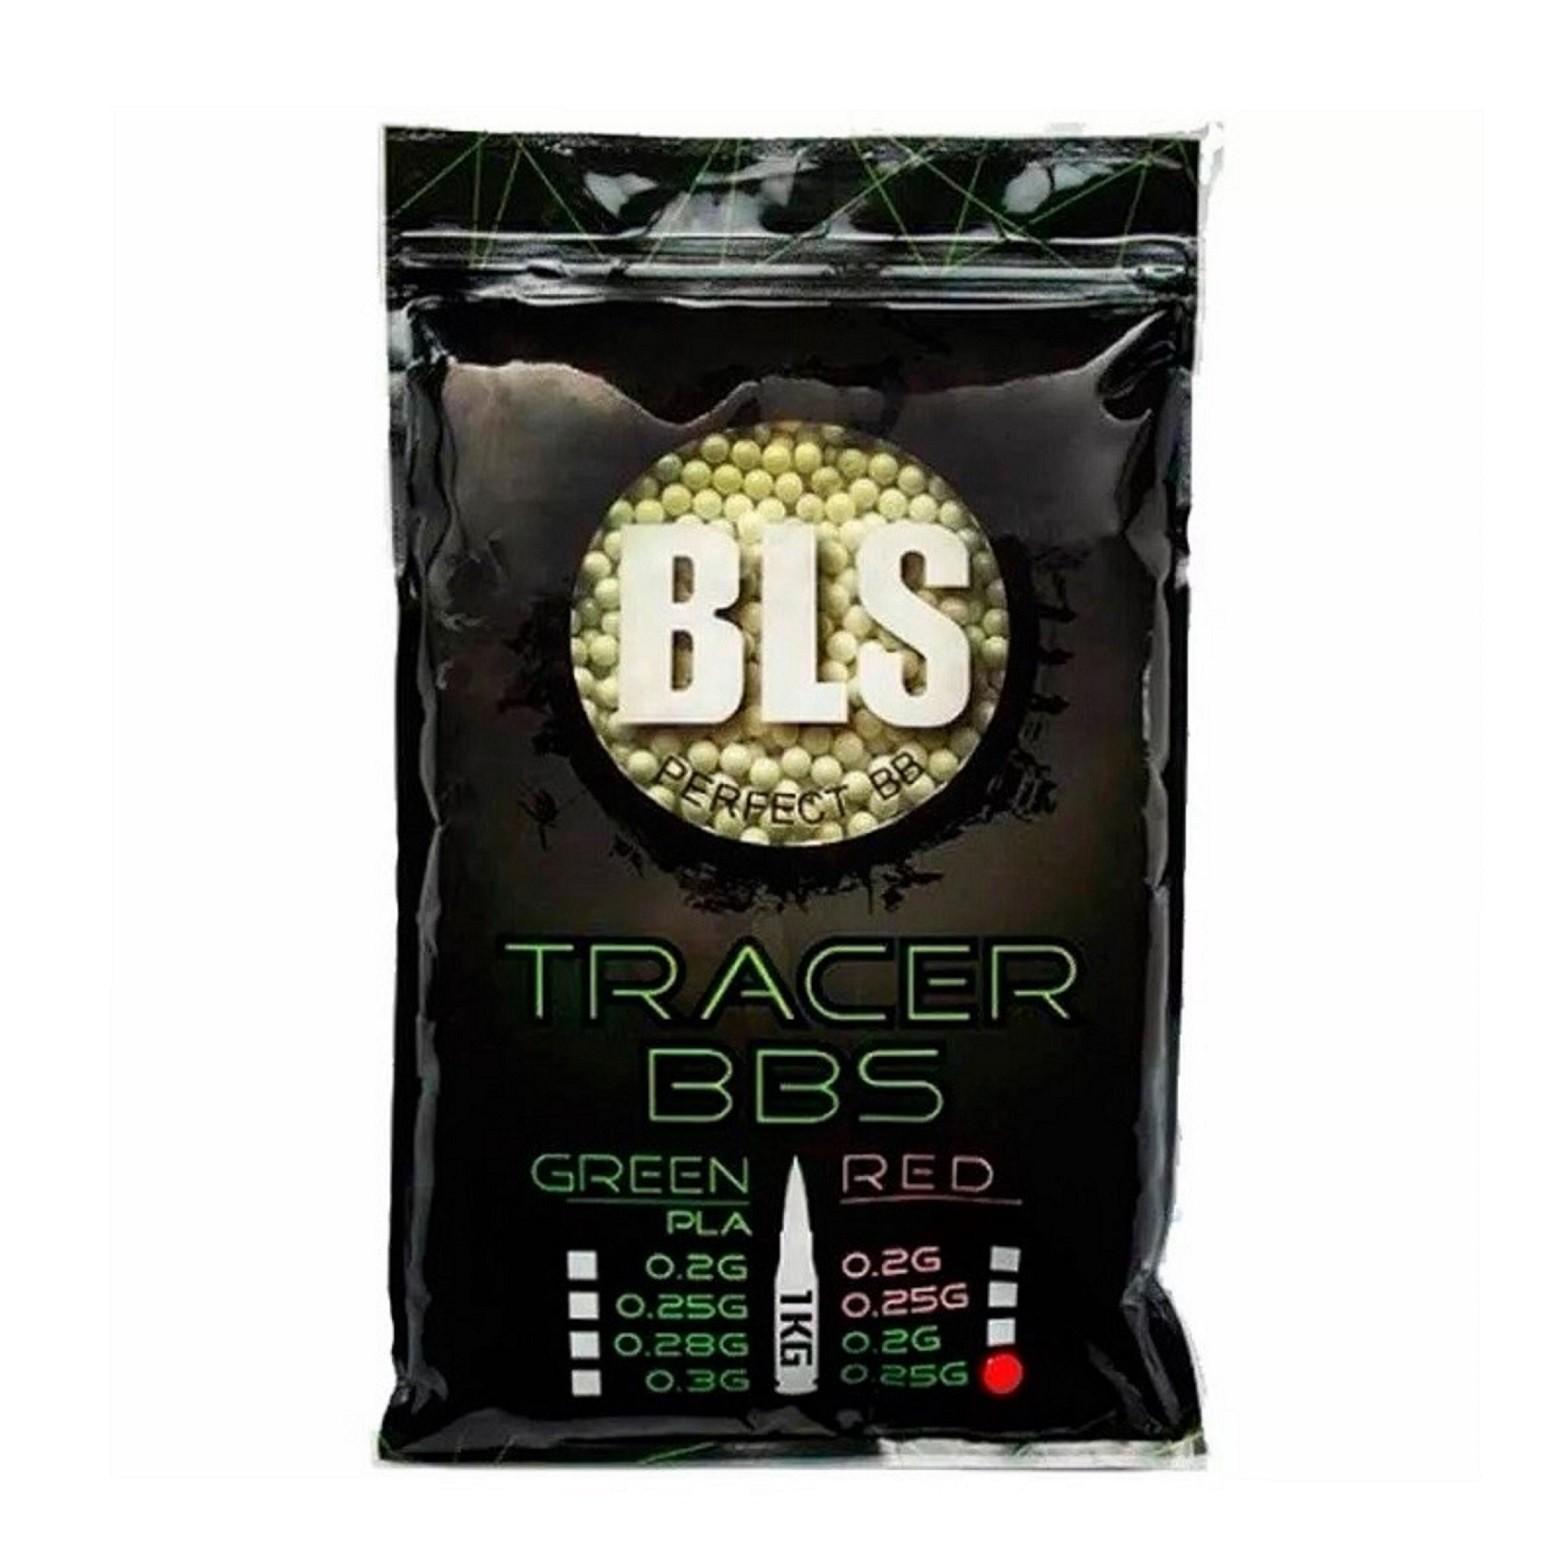 BBS BLS Tracer Green 0,25g com 4000 unidades